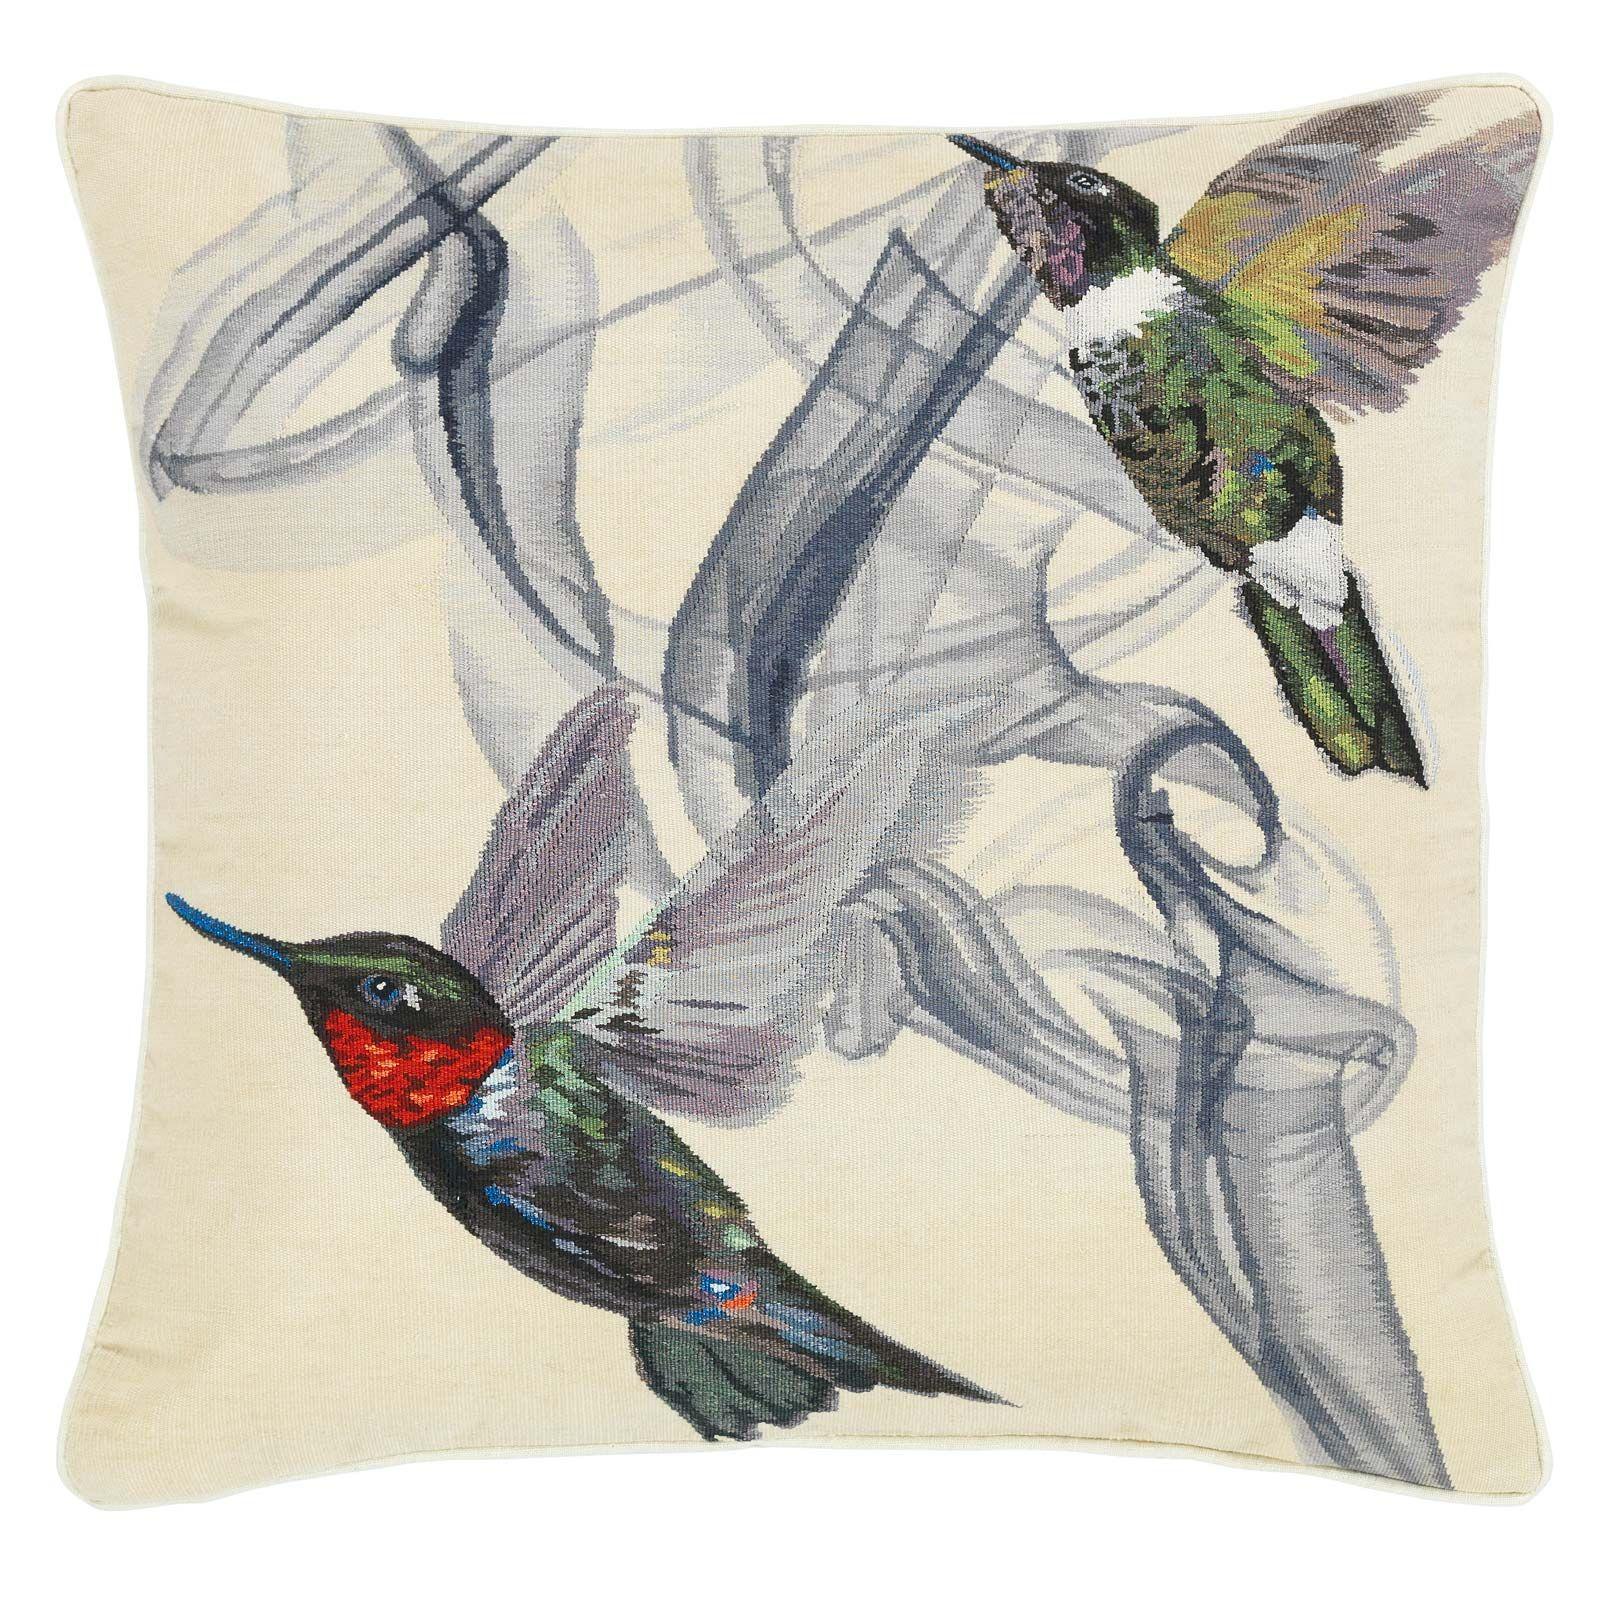 Hummingbird Ivory Cushion By Alexander Mcqueen The Rug Company